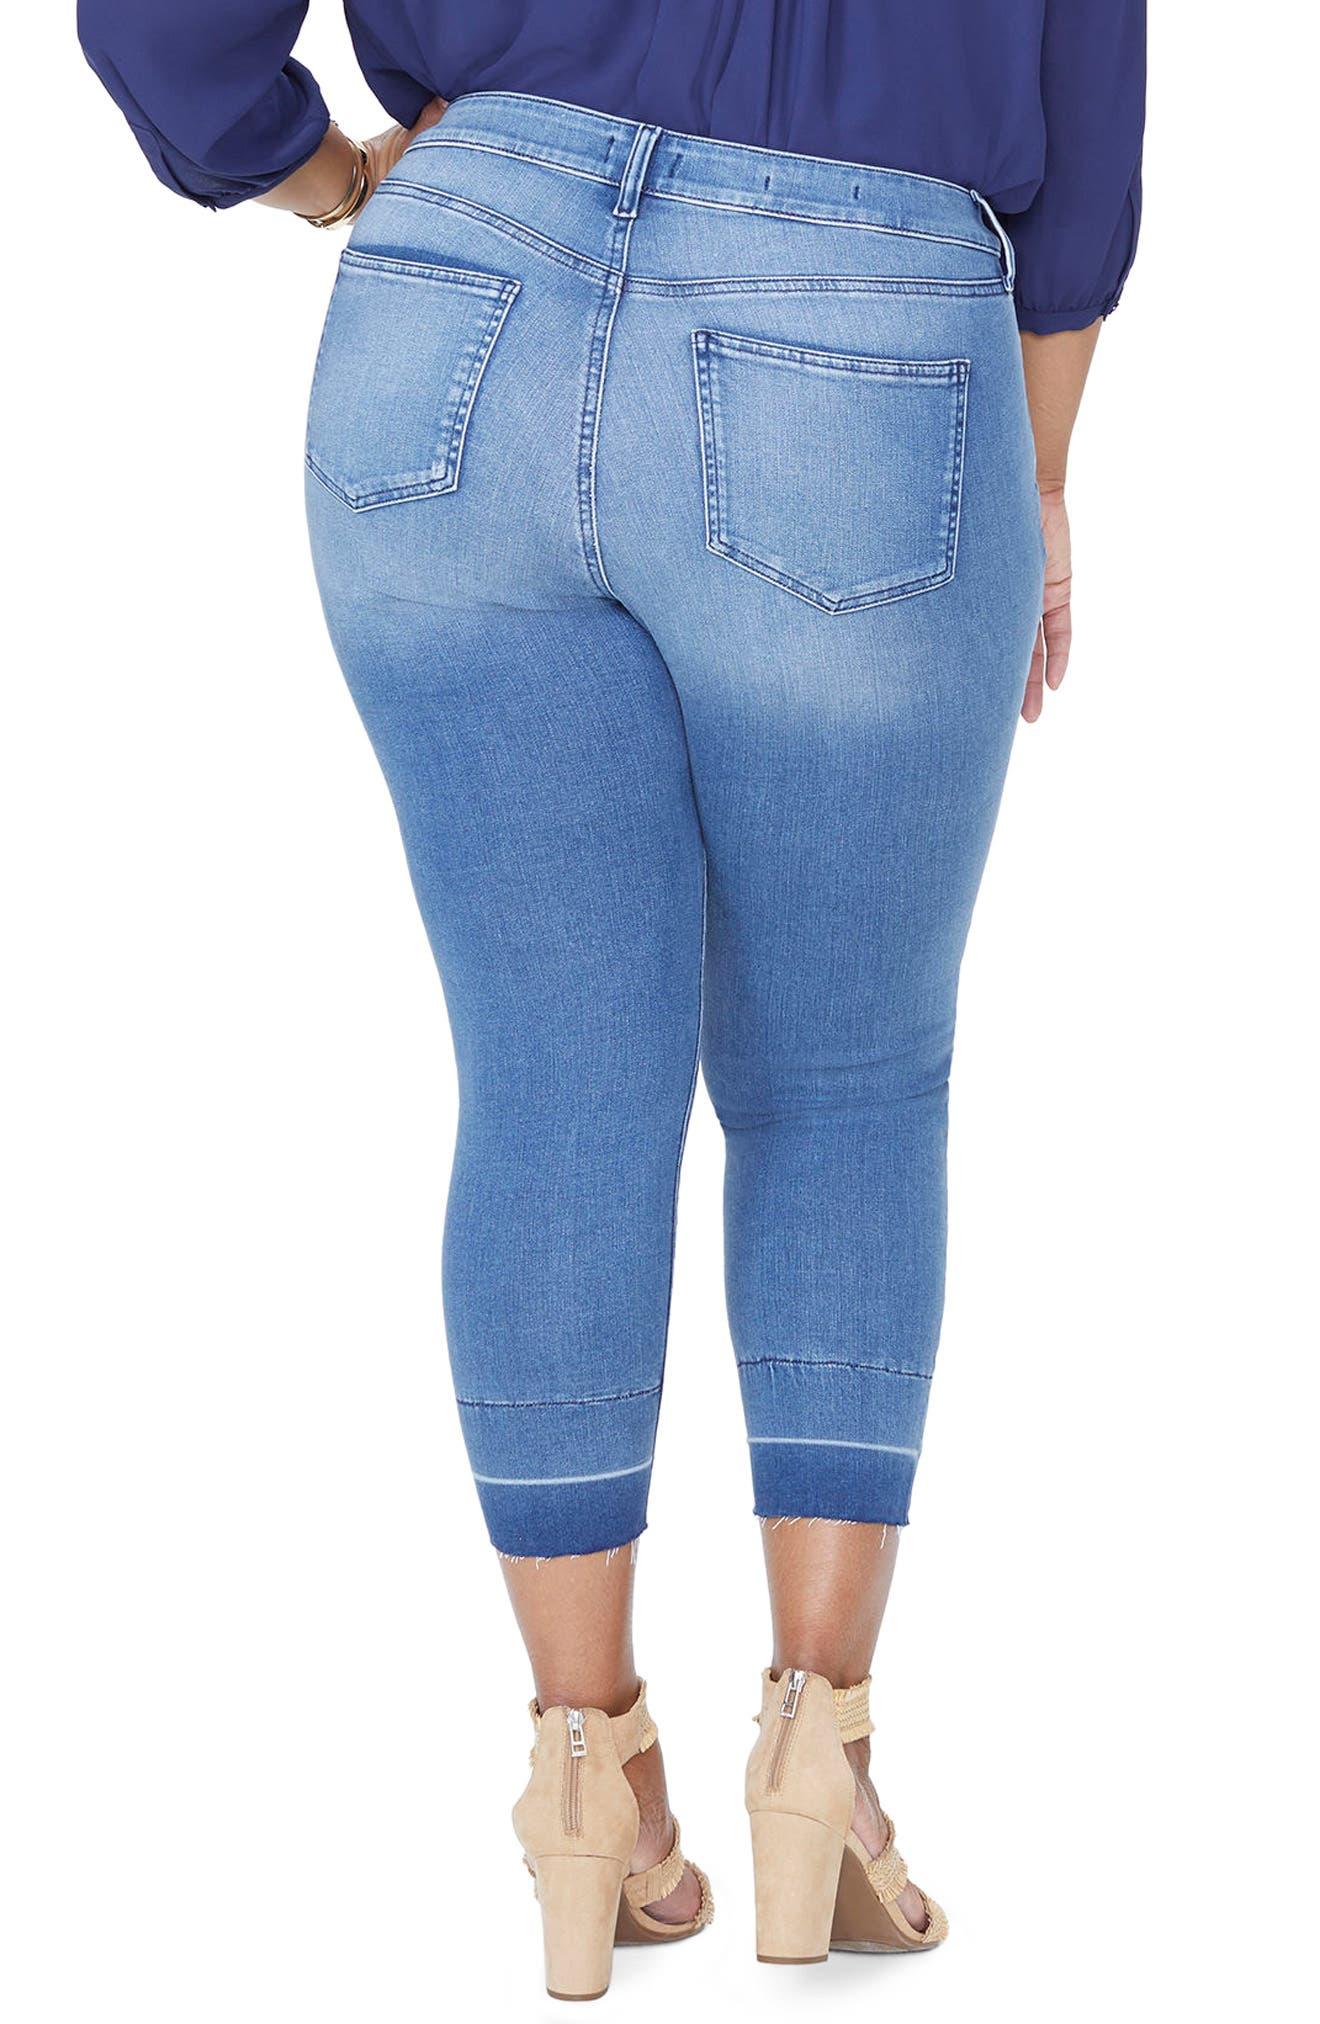 Alina Release Hem Ankle Skinny Jeans,                             Alternate thumbnail 2, color,